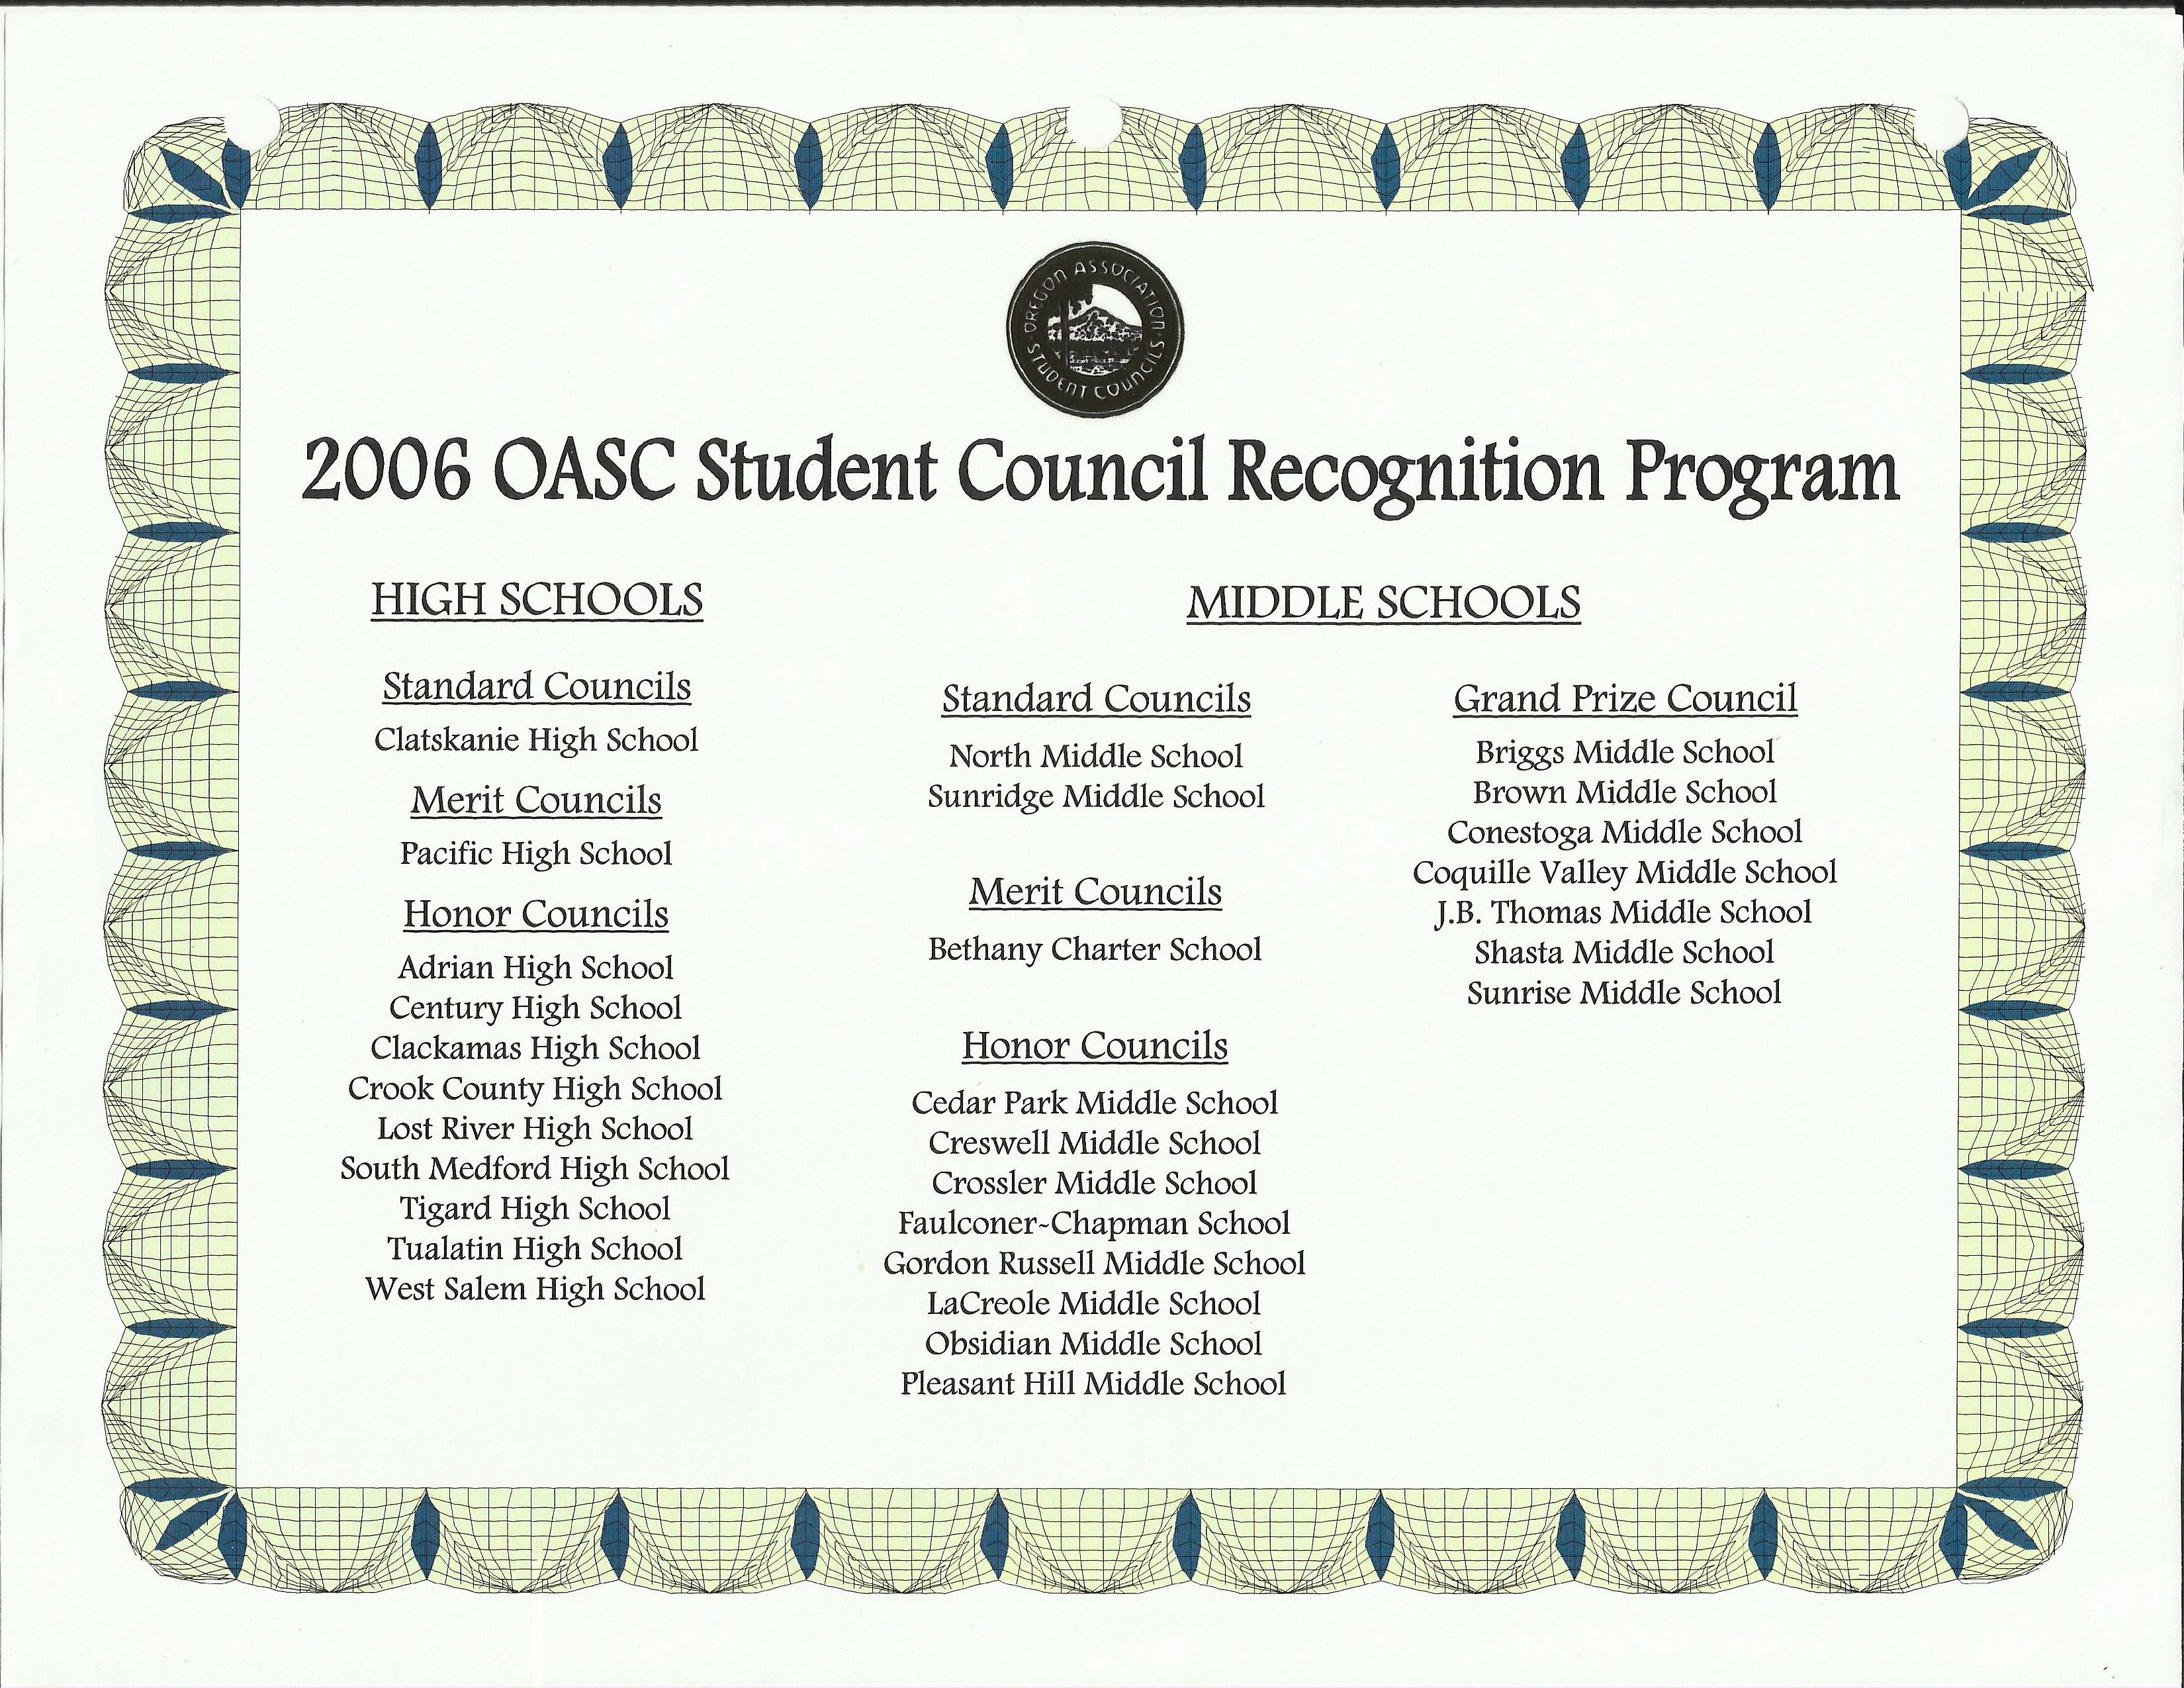 student council leadership recognition program ms hs oasc